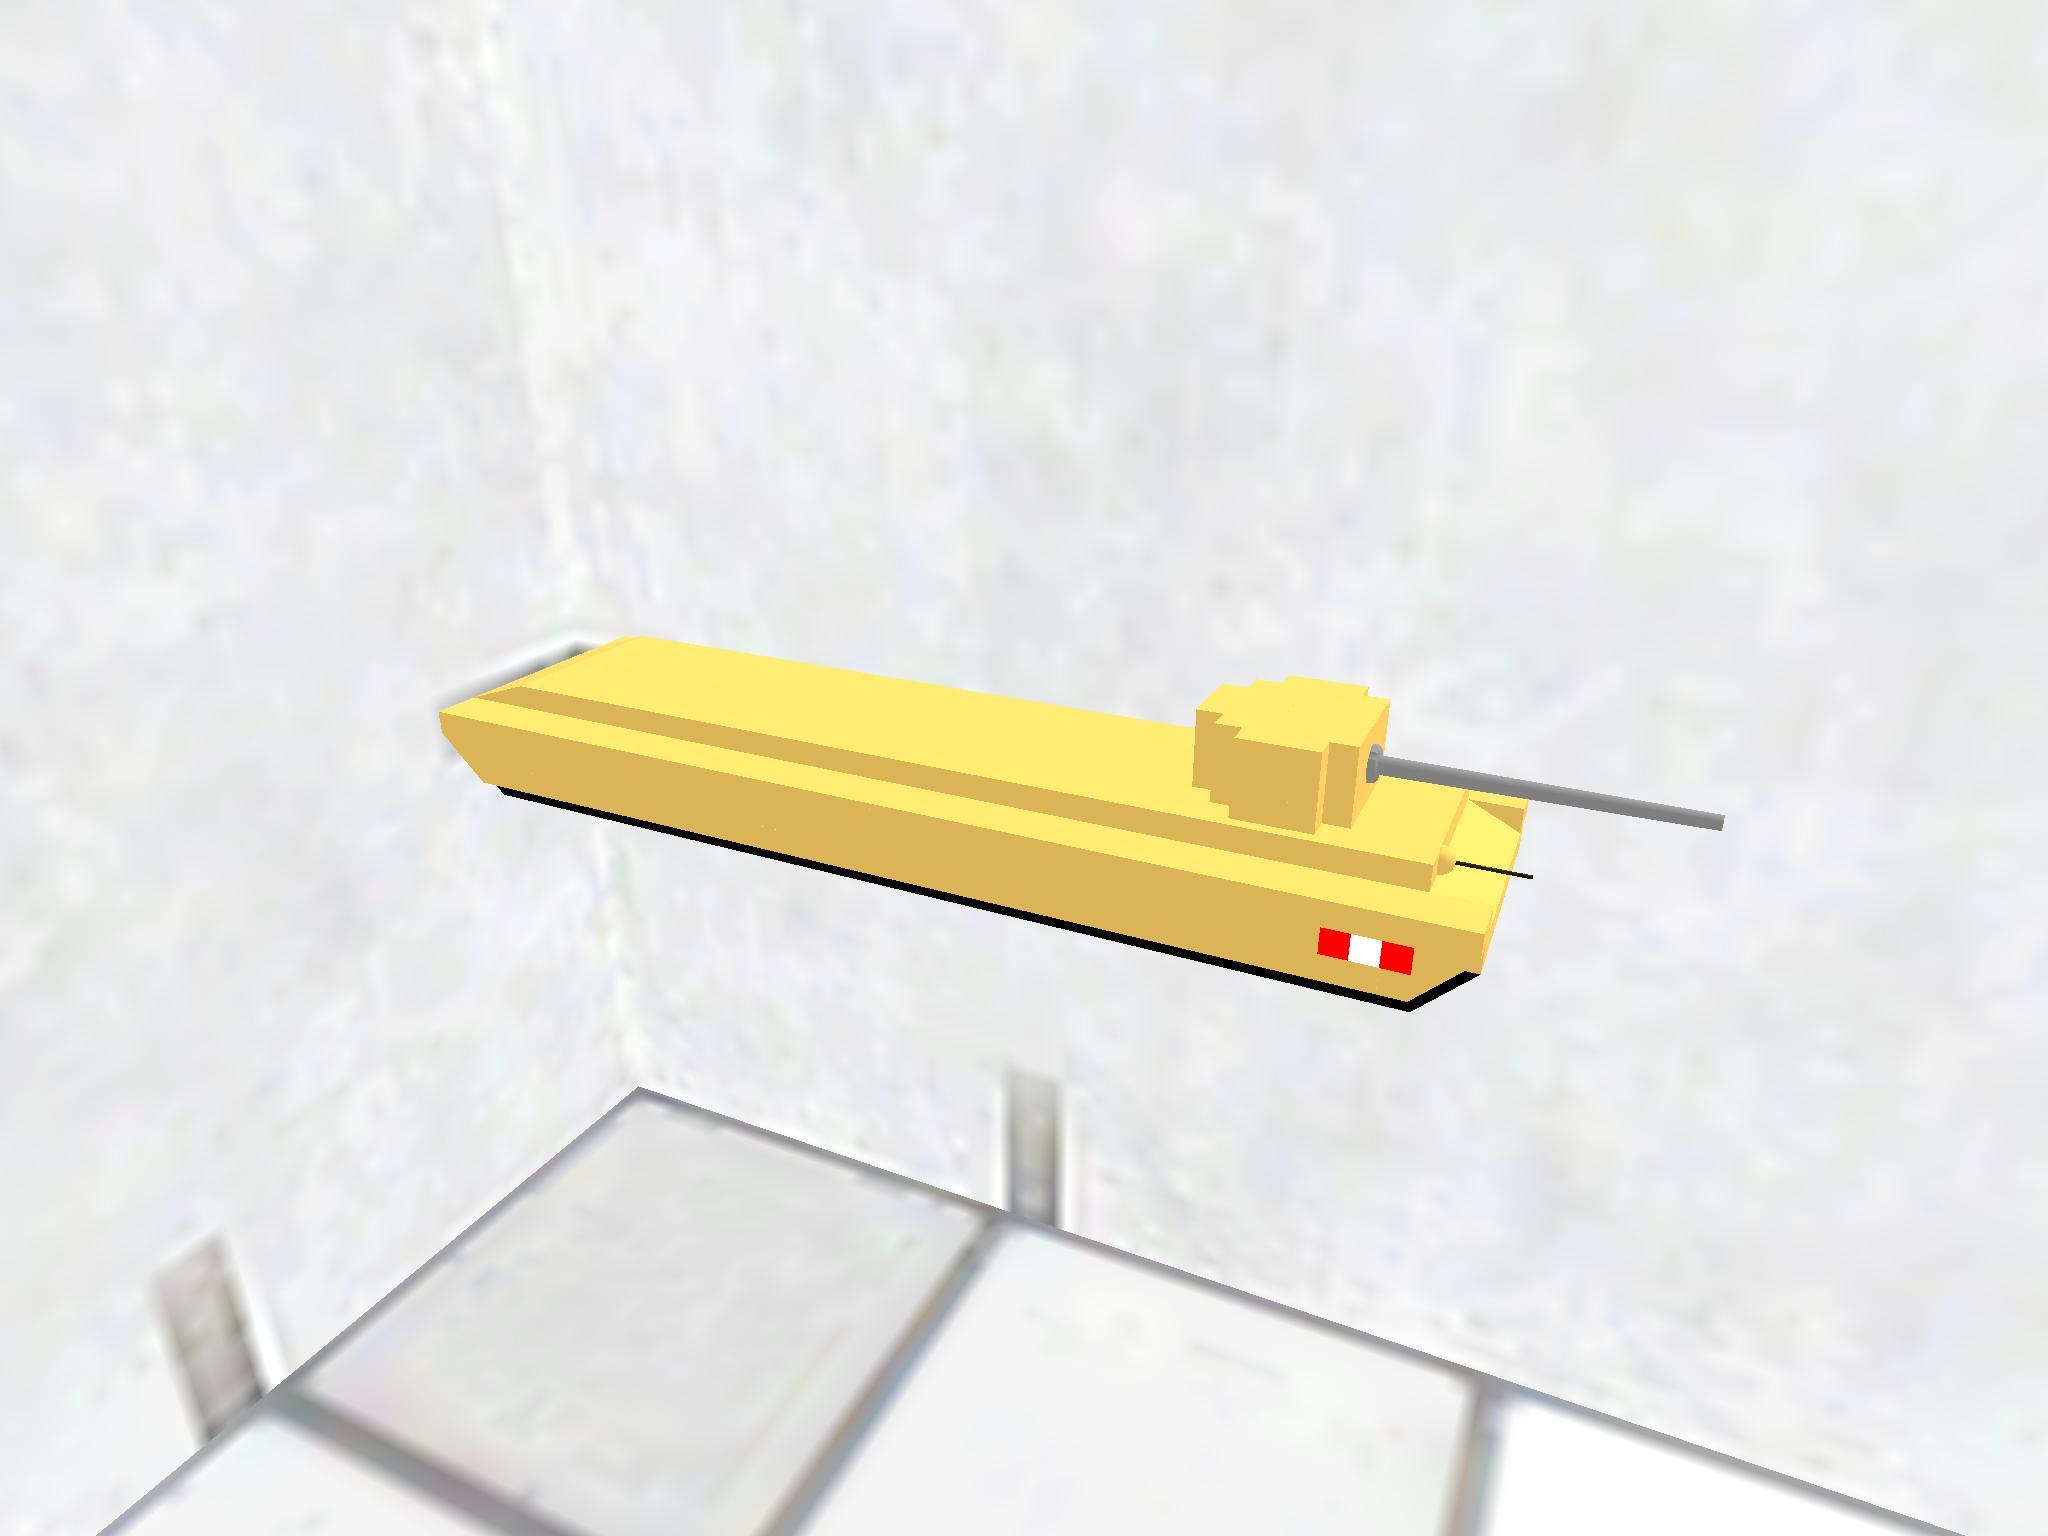 Tog II Heavy Tank